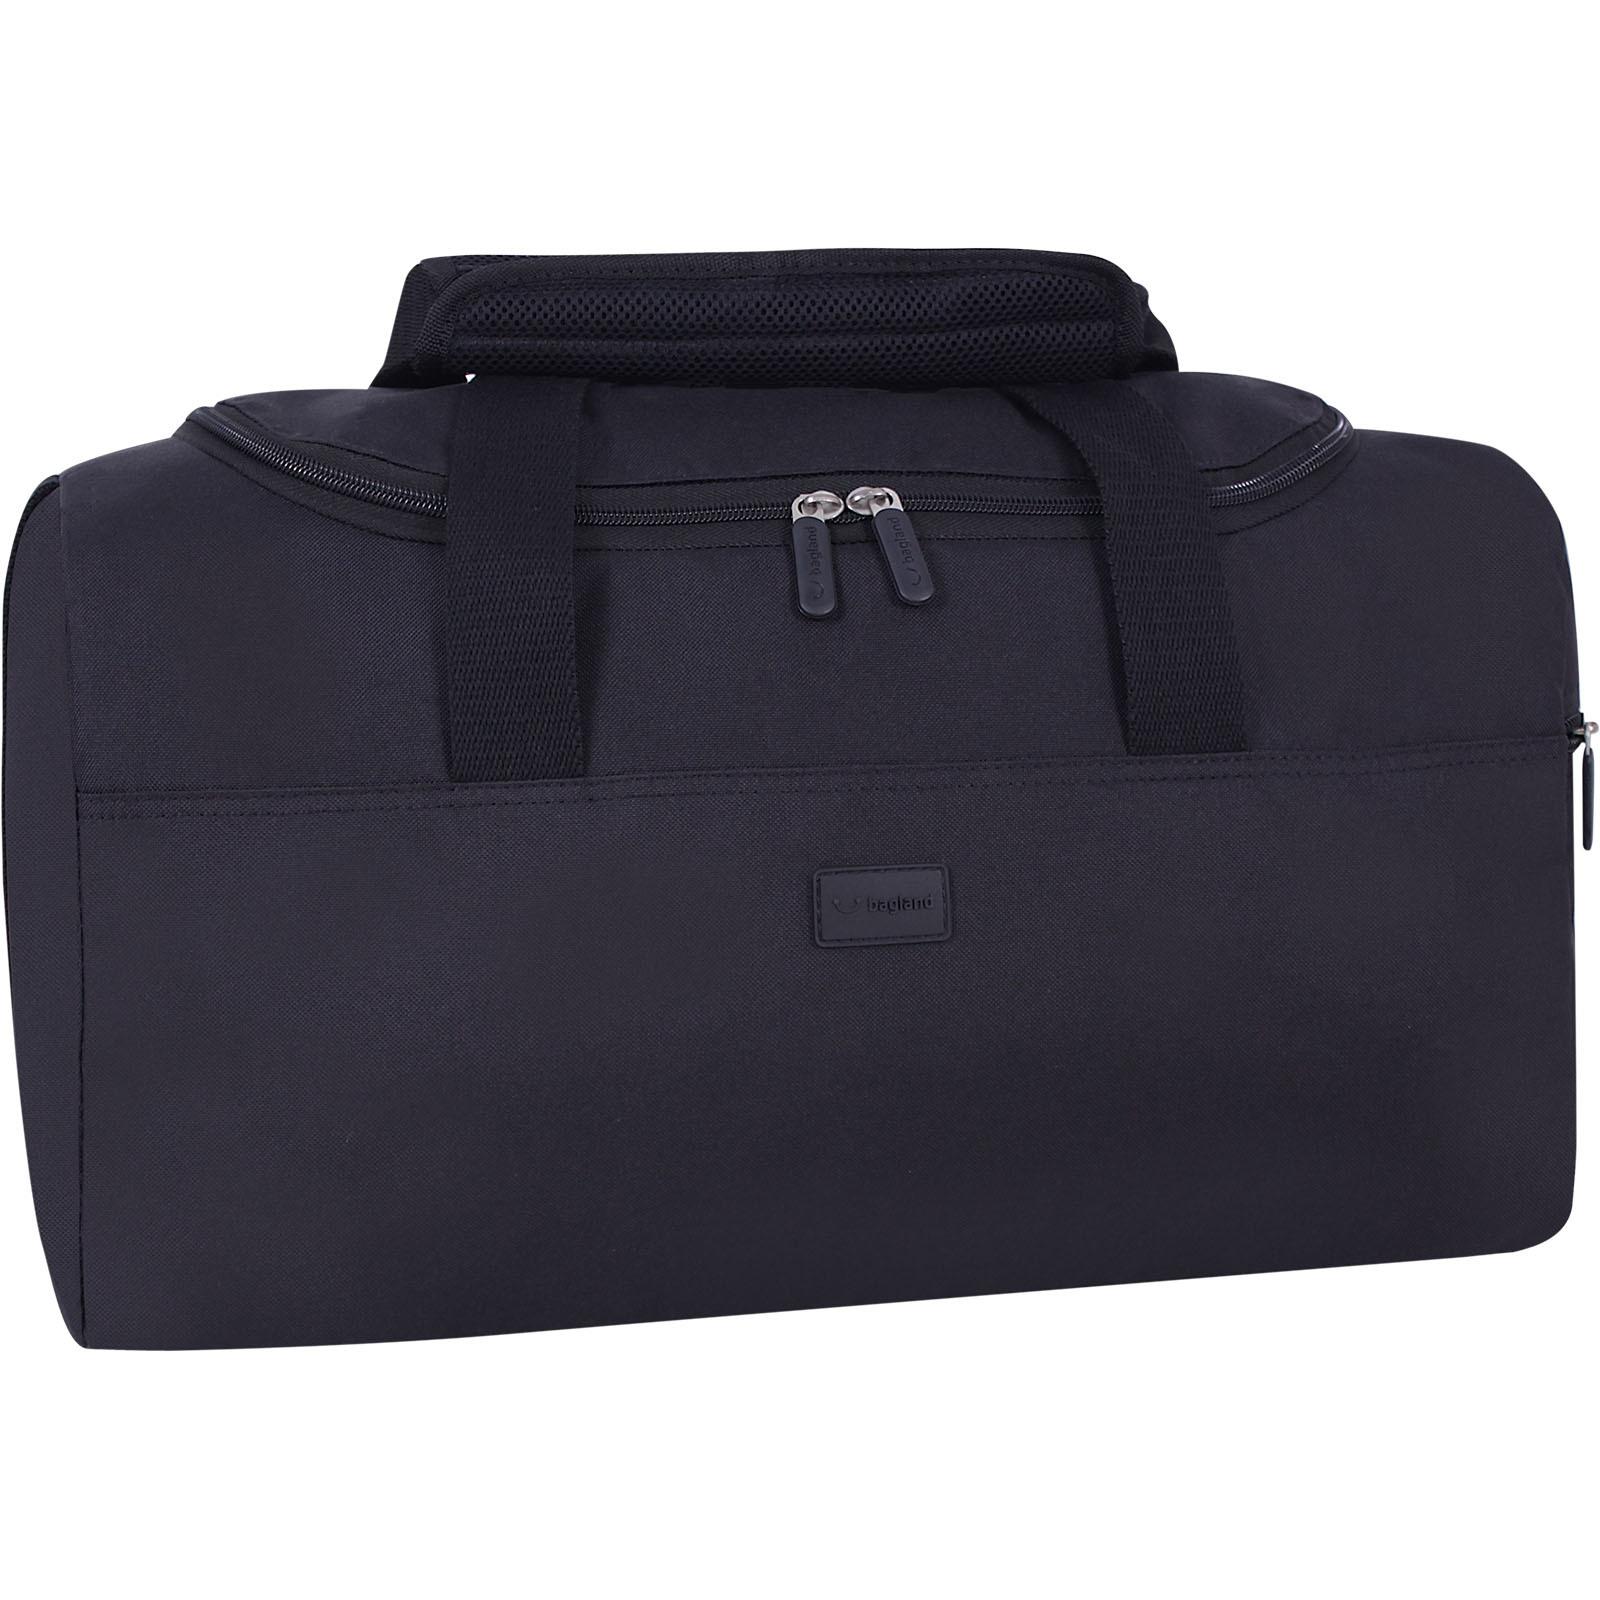 Дорожные сумки Сумка Bagland Boston 25 л. Чёрный (0037466) IMG_5988-1600.jpg